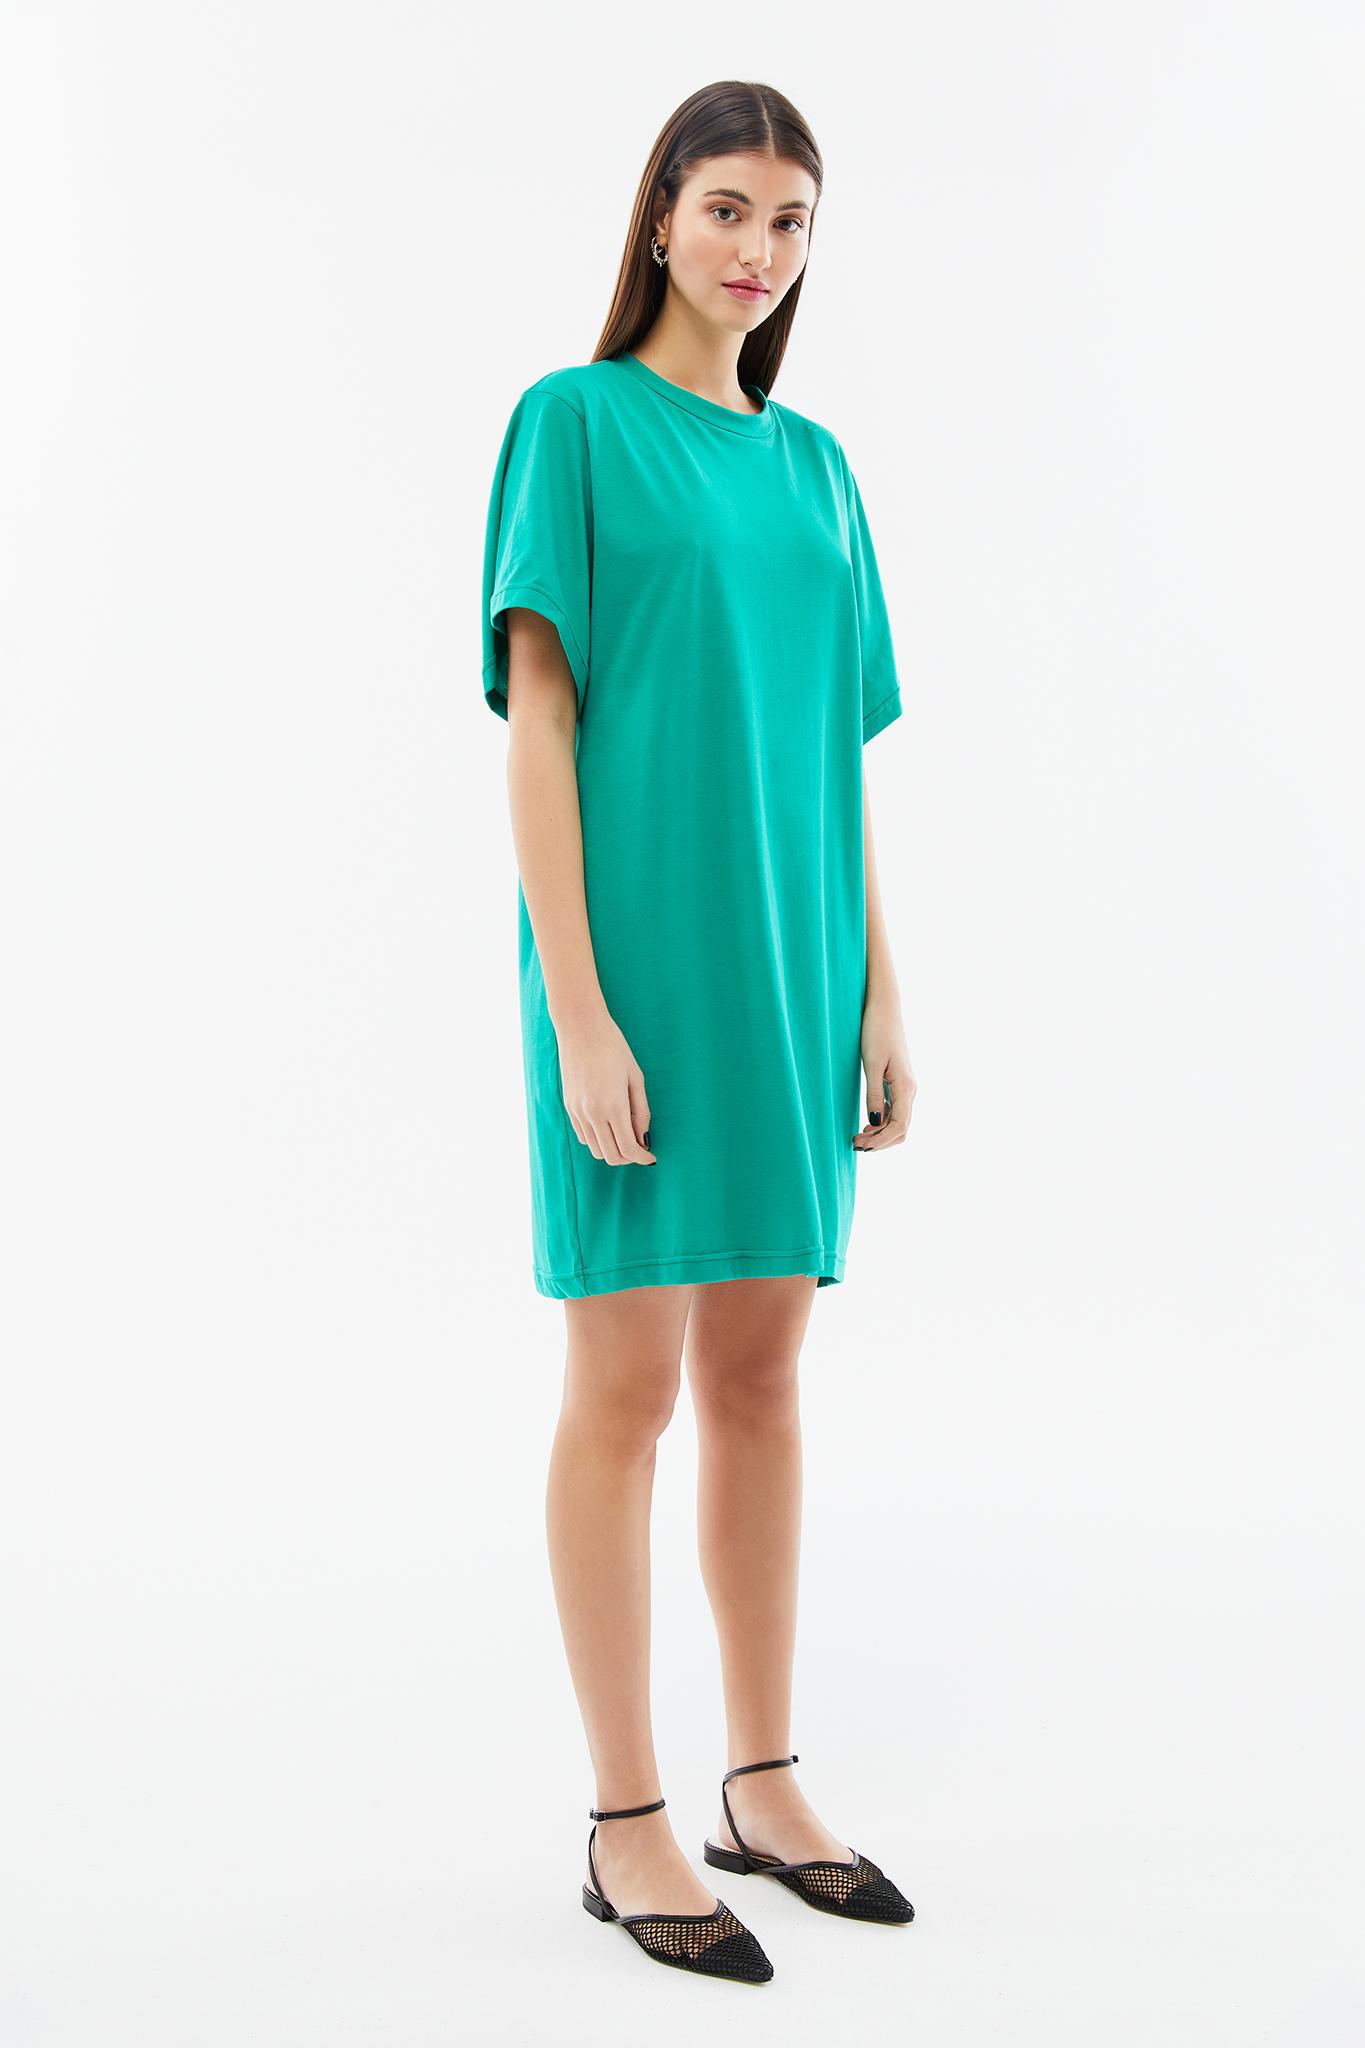 BLAMEYOURDAZE TSHIRT GREEN DRESS